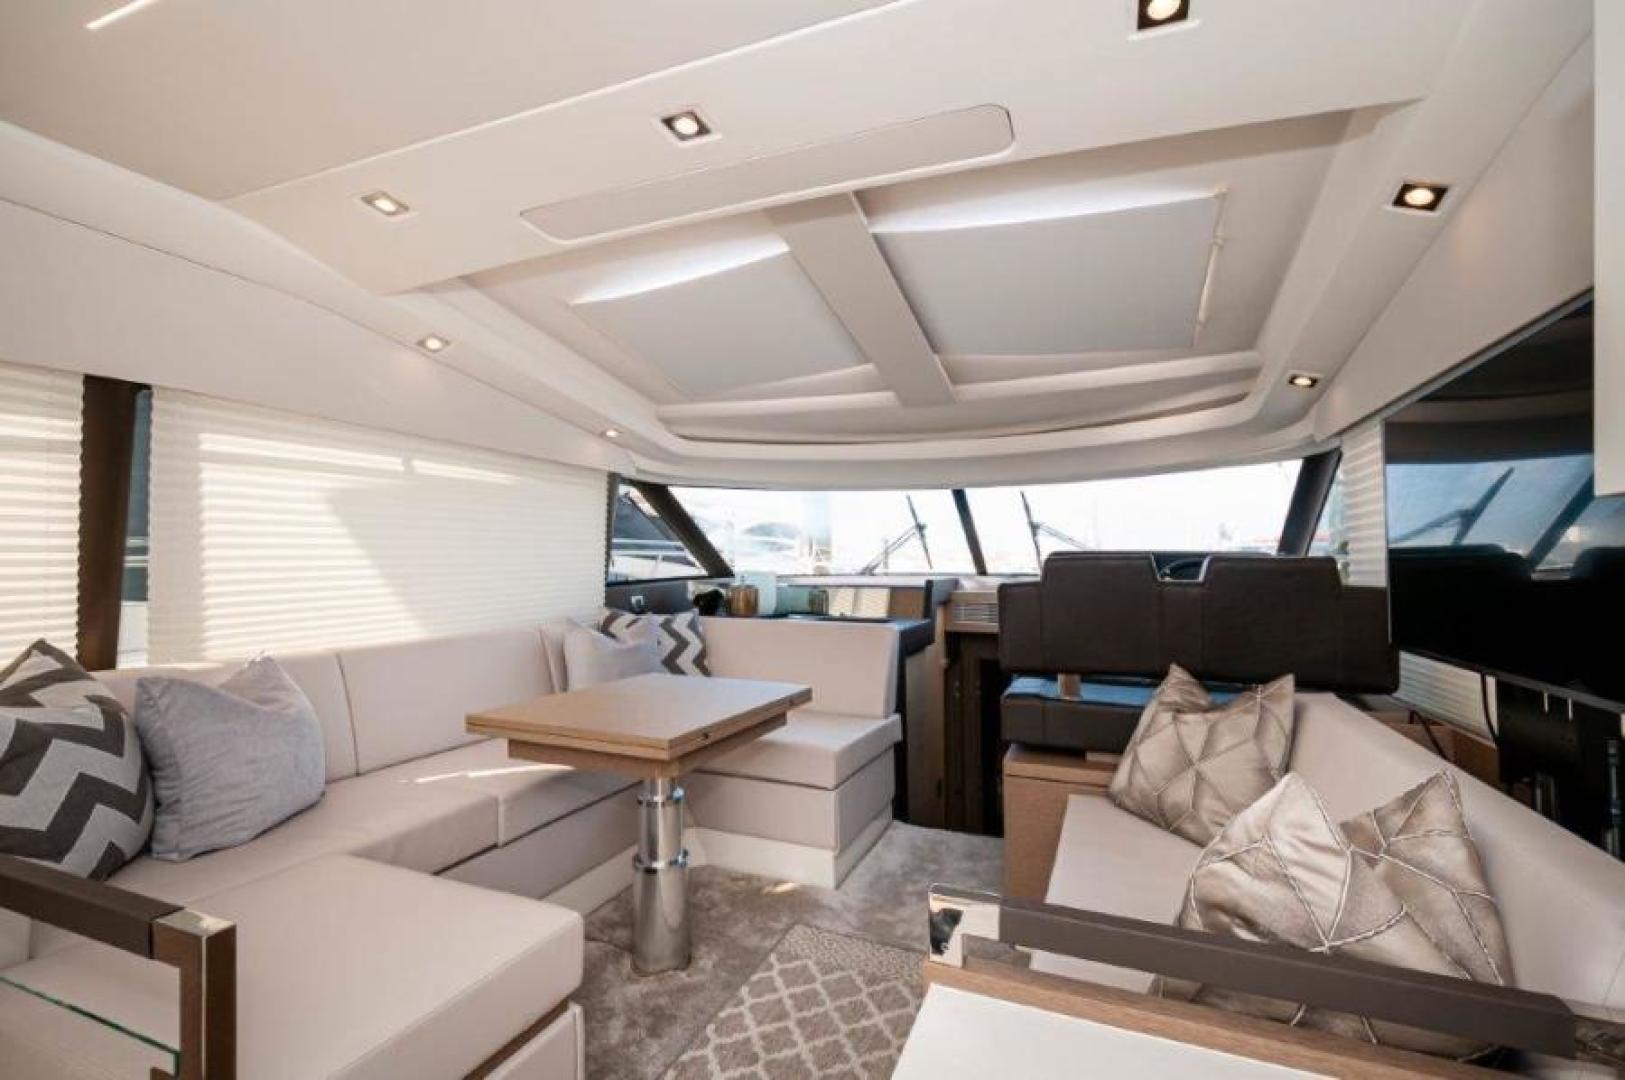 Prestige-460 S 2018-Unforgettable St Petersburg-Florida-United States-2018 Prestige 460 S Yacht  Unforgettable  Dinette-1444310   Thumbnail